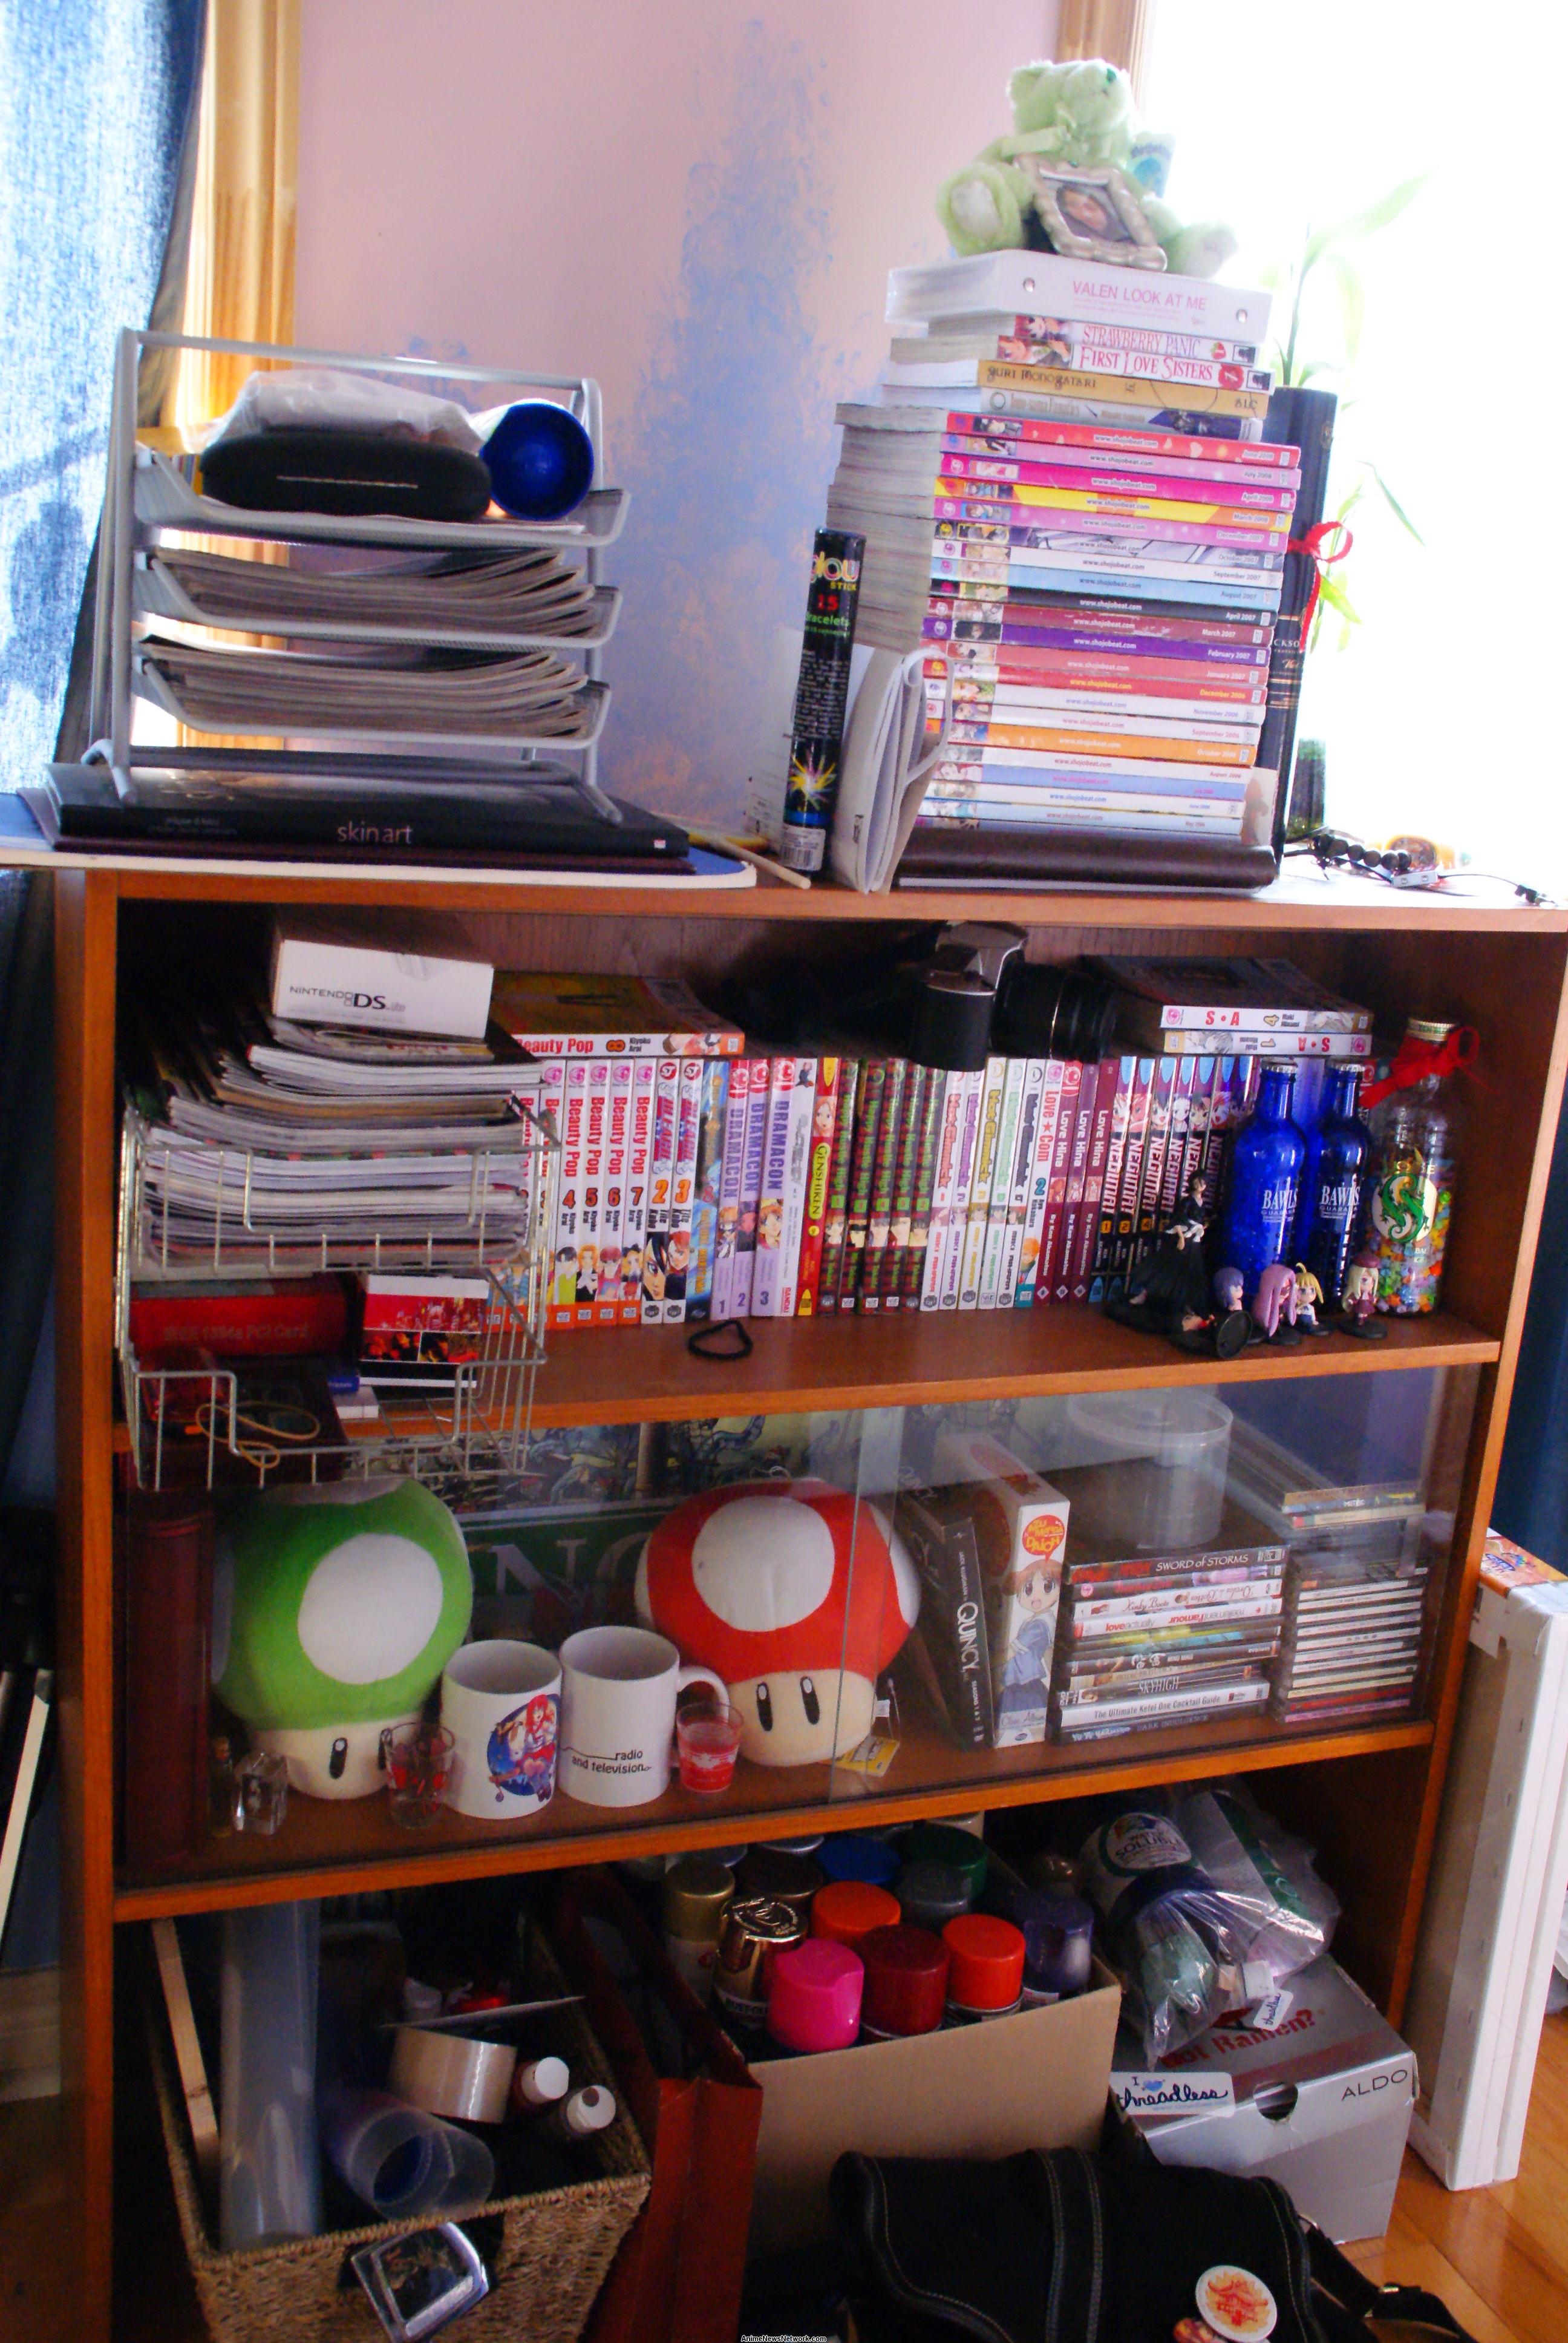 Club magic shelf life anime news network for Shelf life of paint